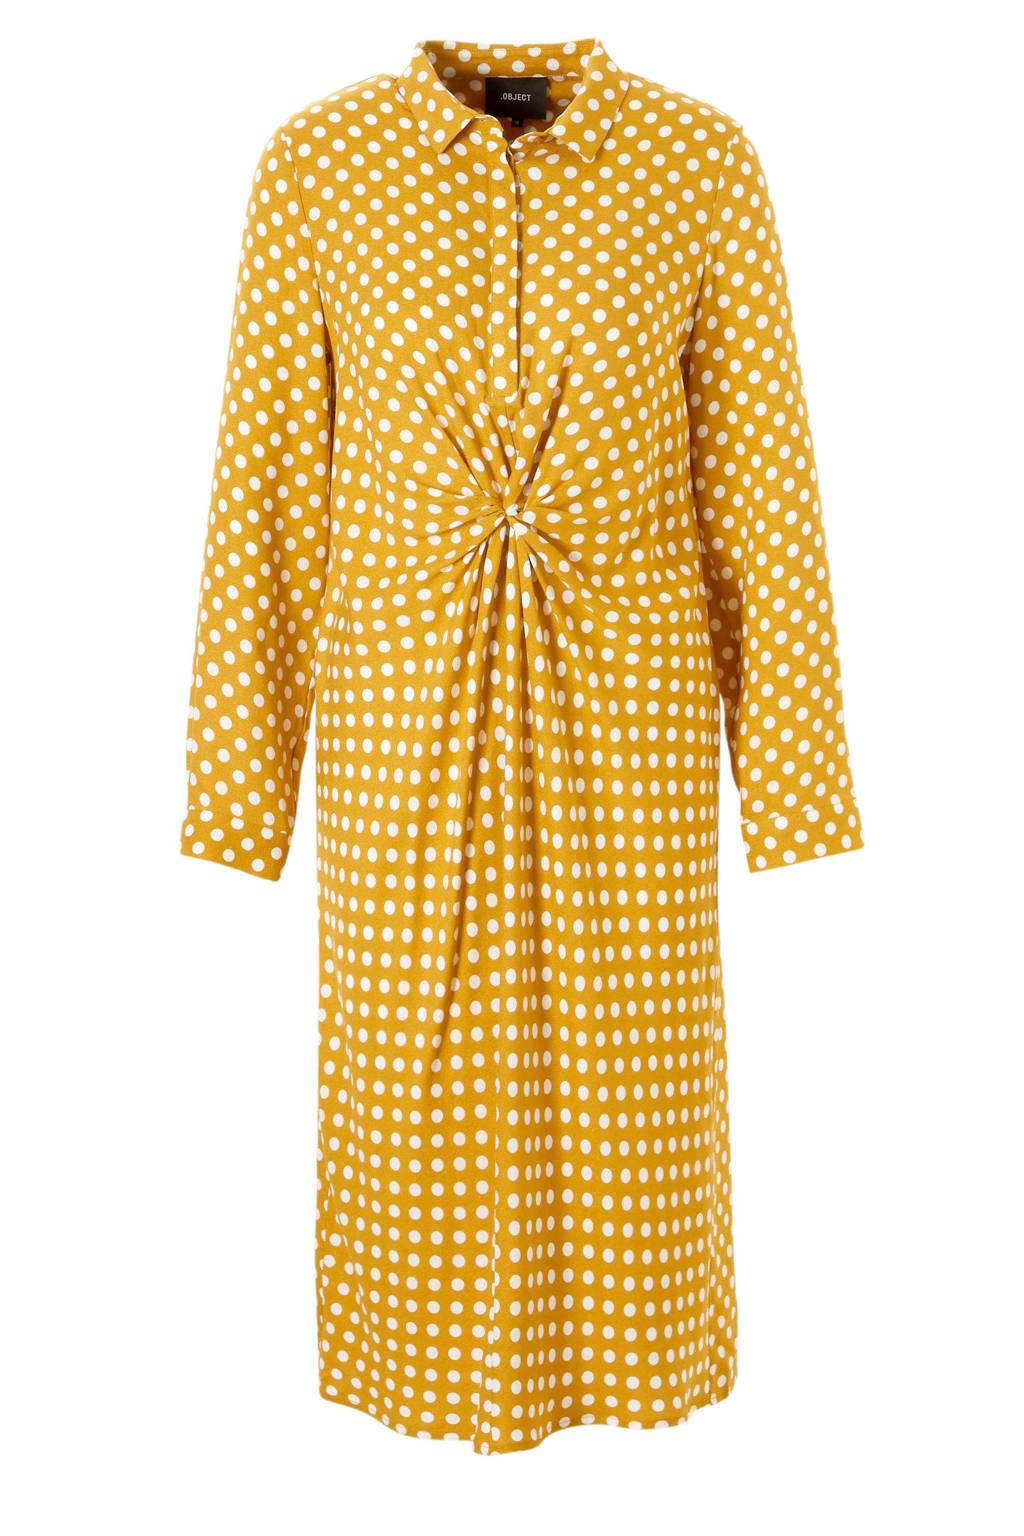 OBJECT gestipte jurk met plooien, Geel/wit